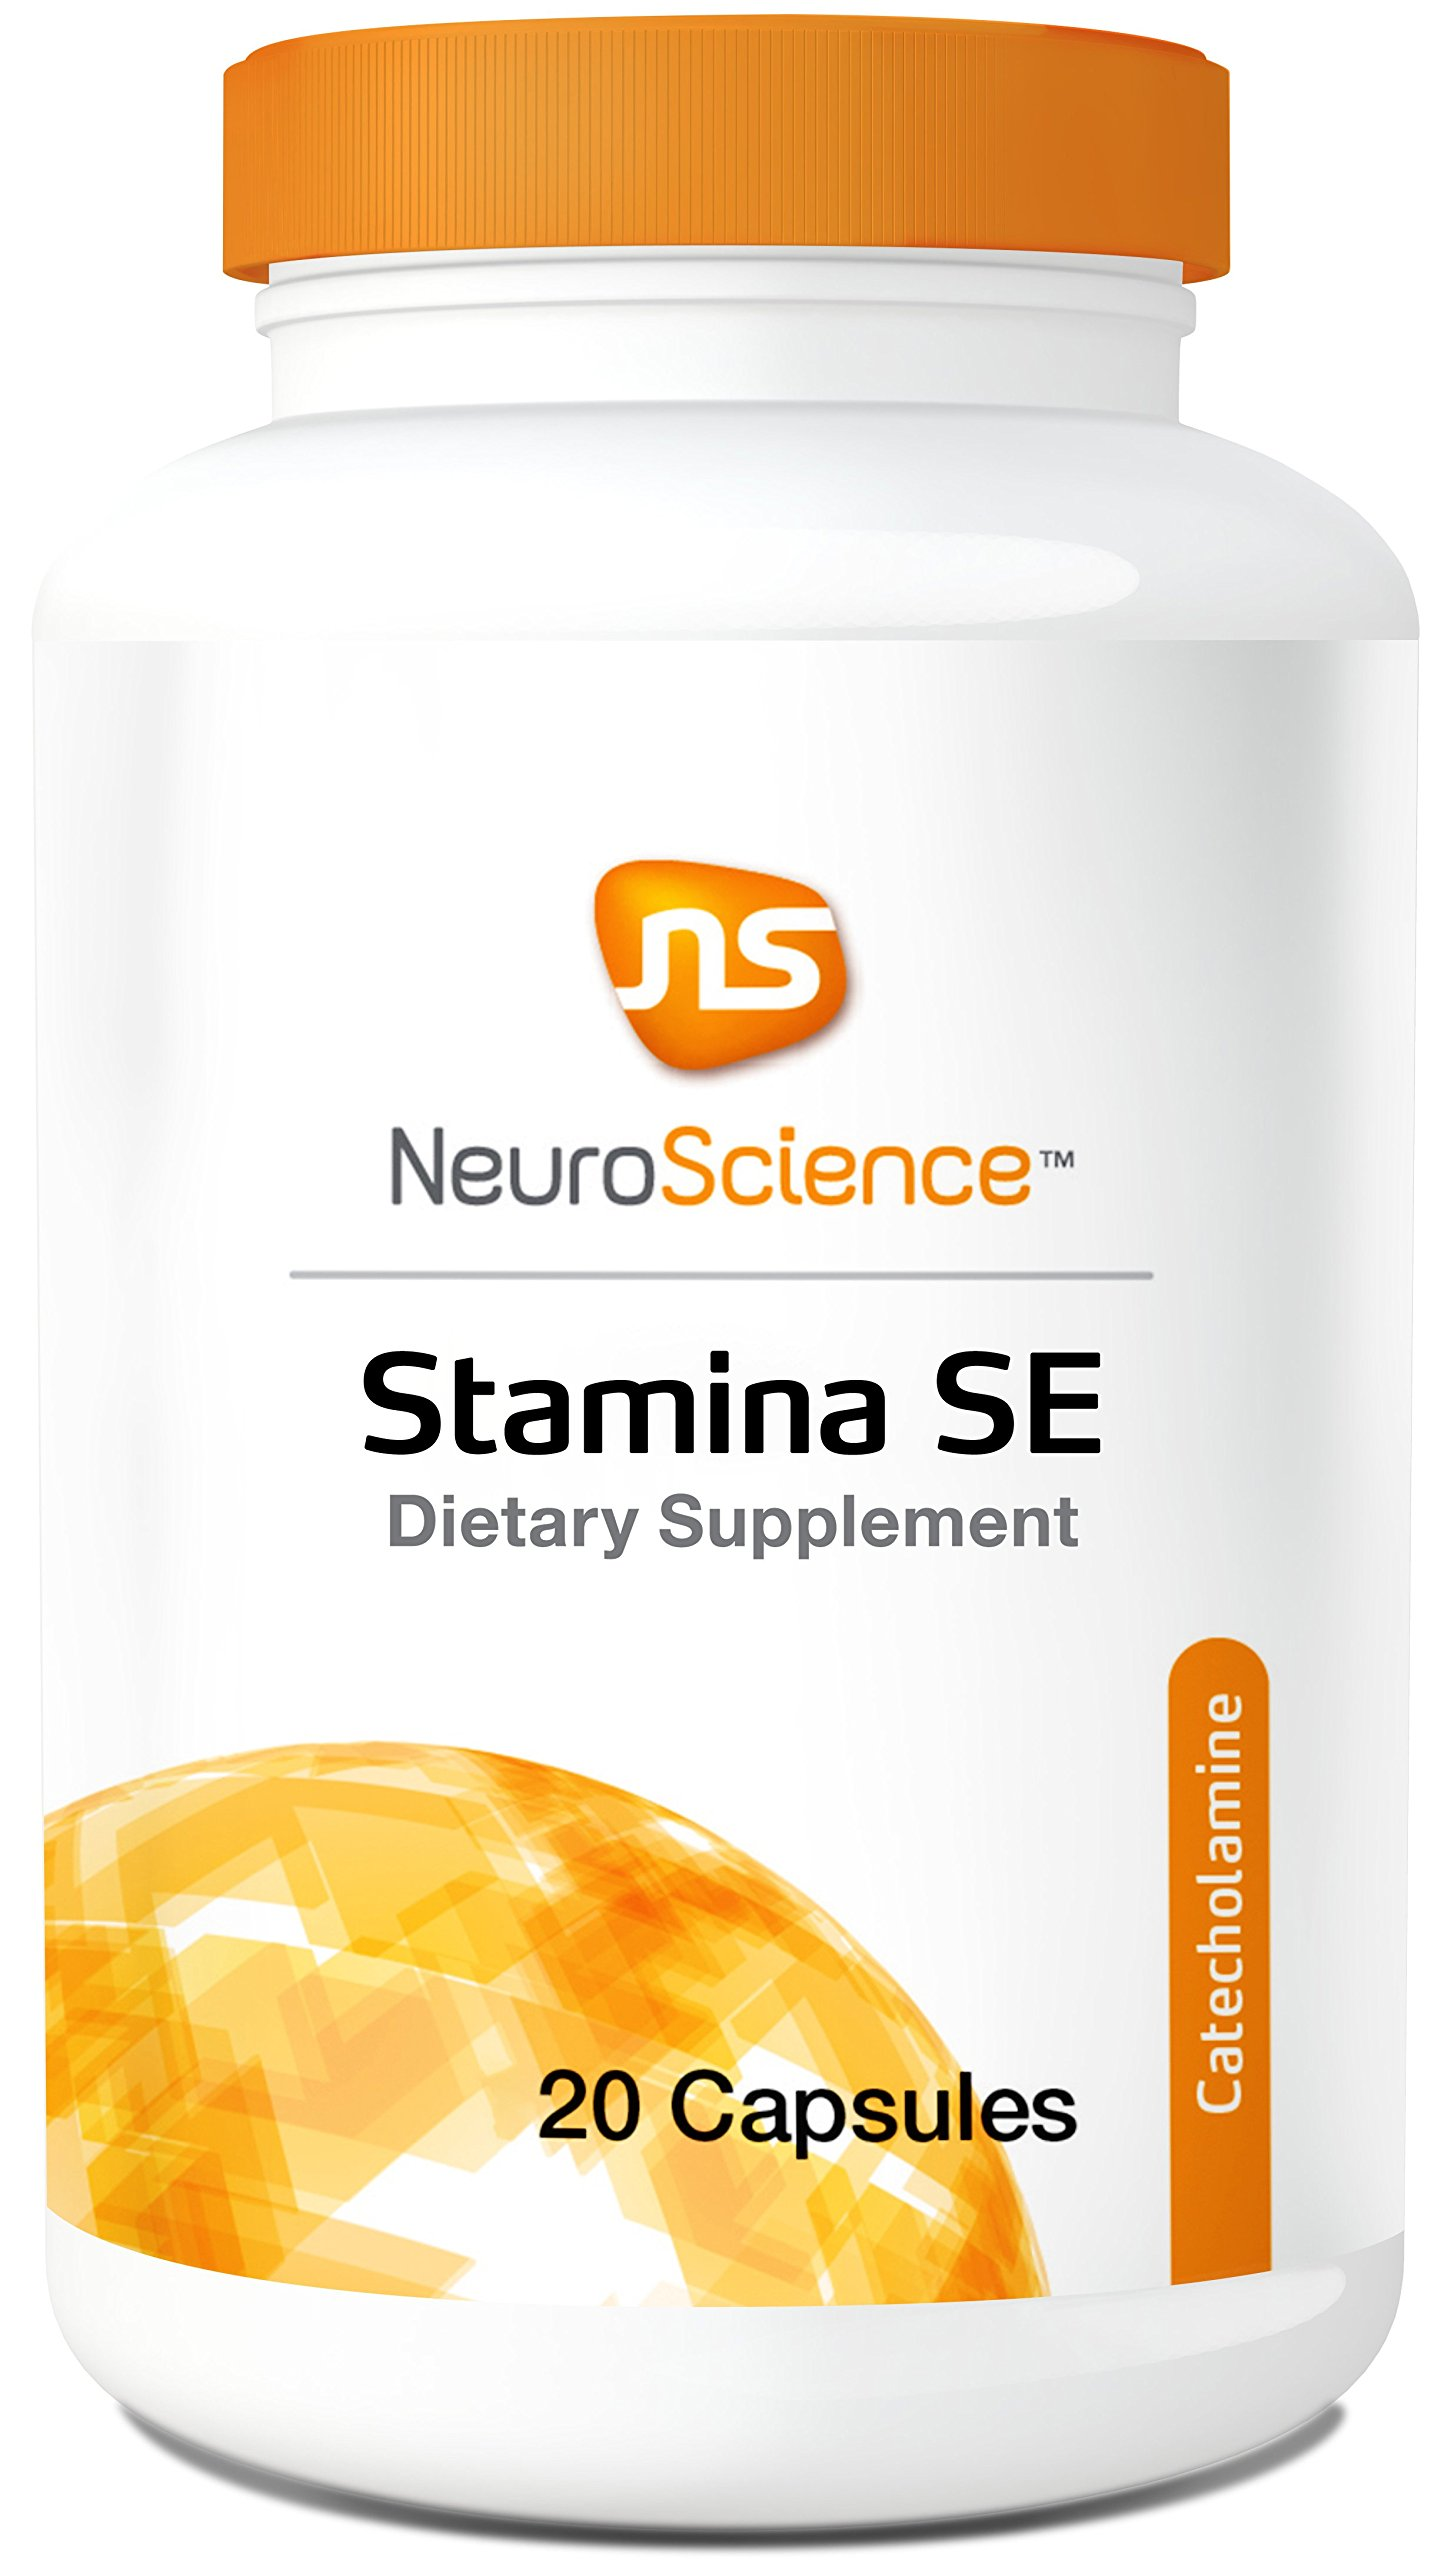 Neuroscience - Stamina SE with L-Citrulline & Acetyl-L-Carnitine, 20 Capsules